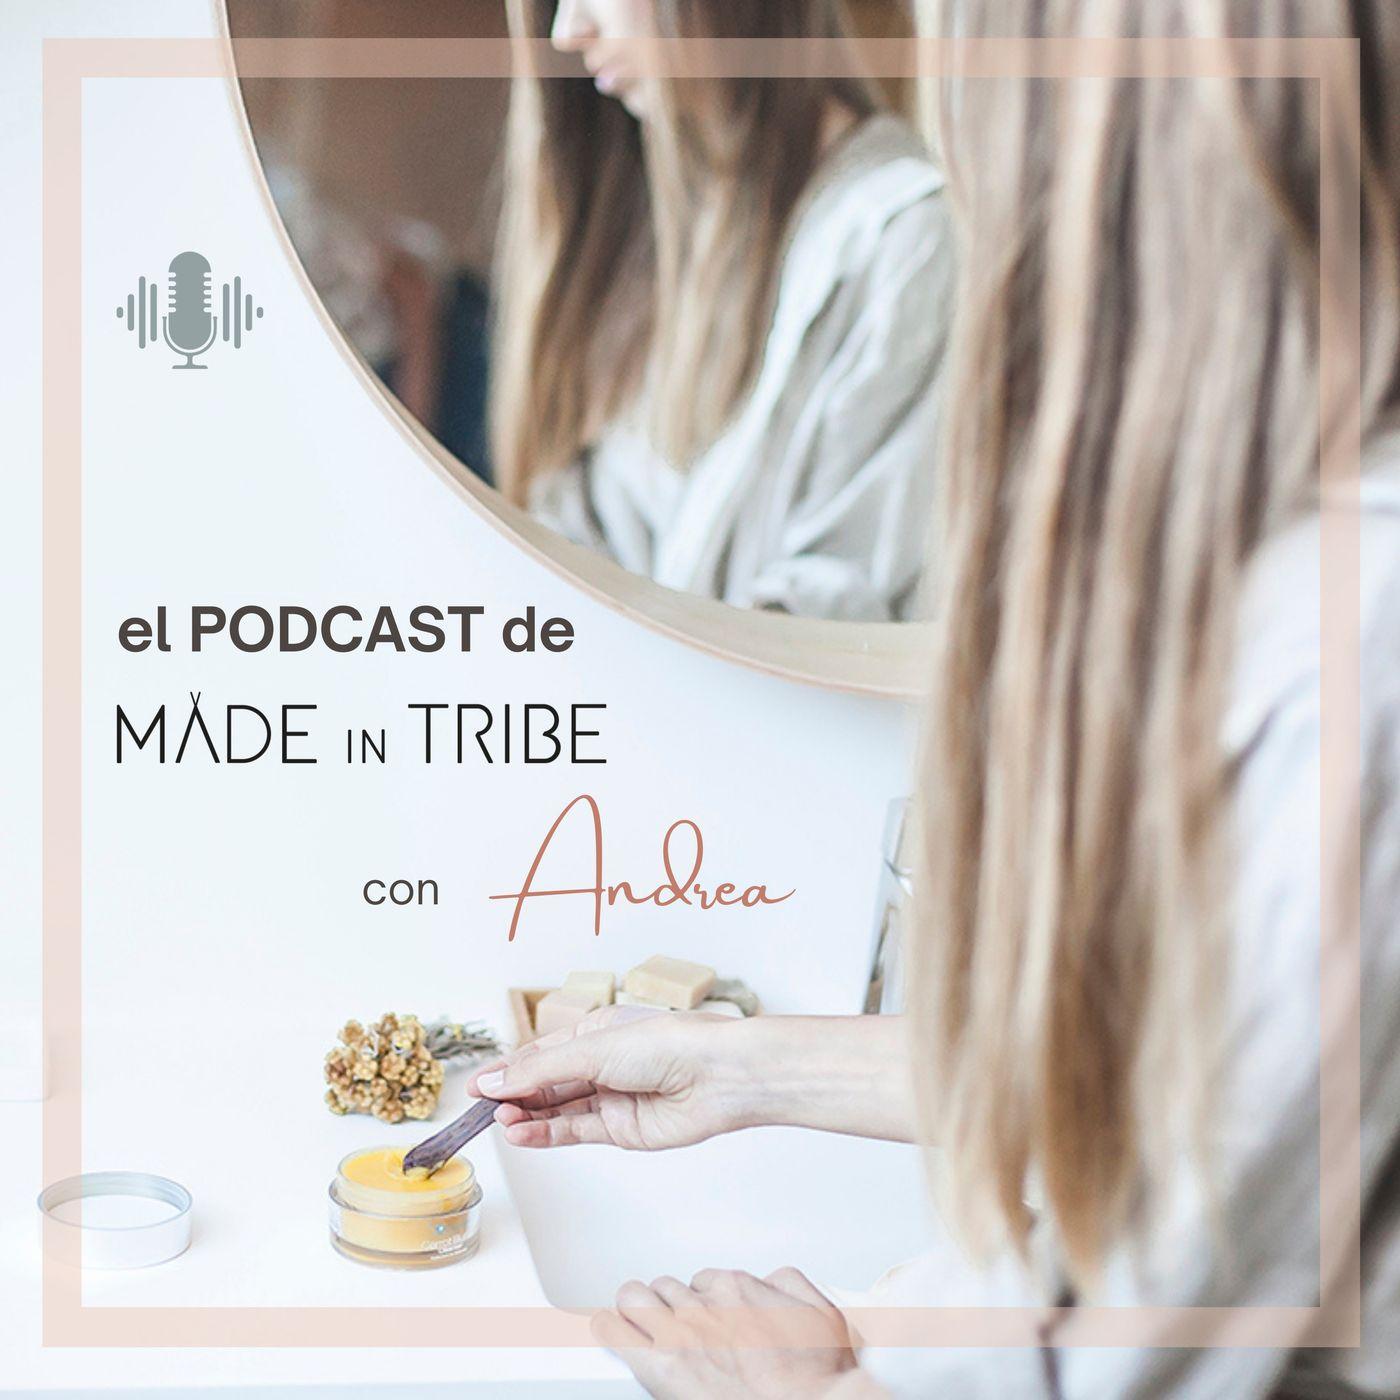 El podcast de Made in Tribe con Andrea